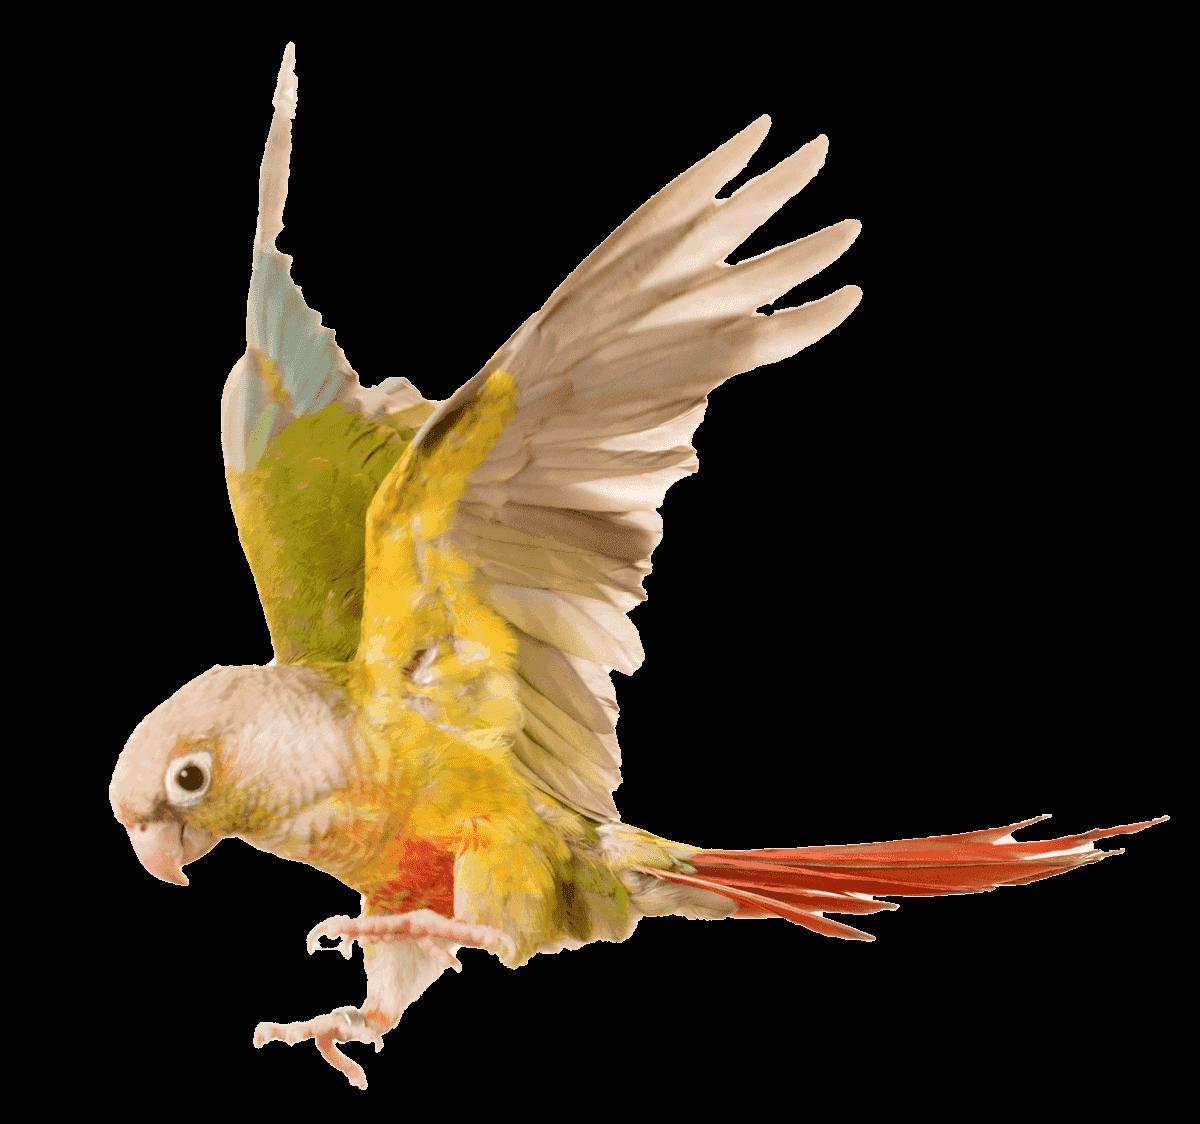 birdResampled